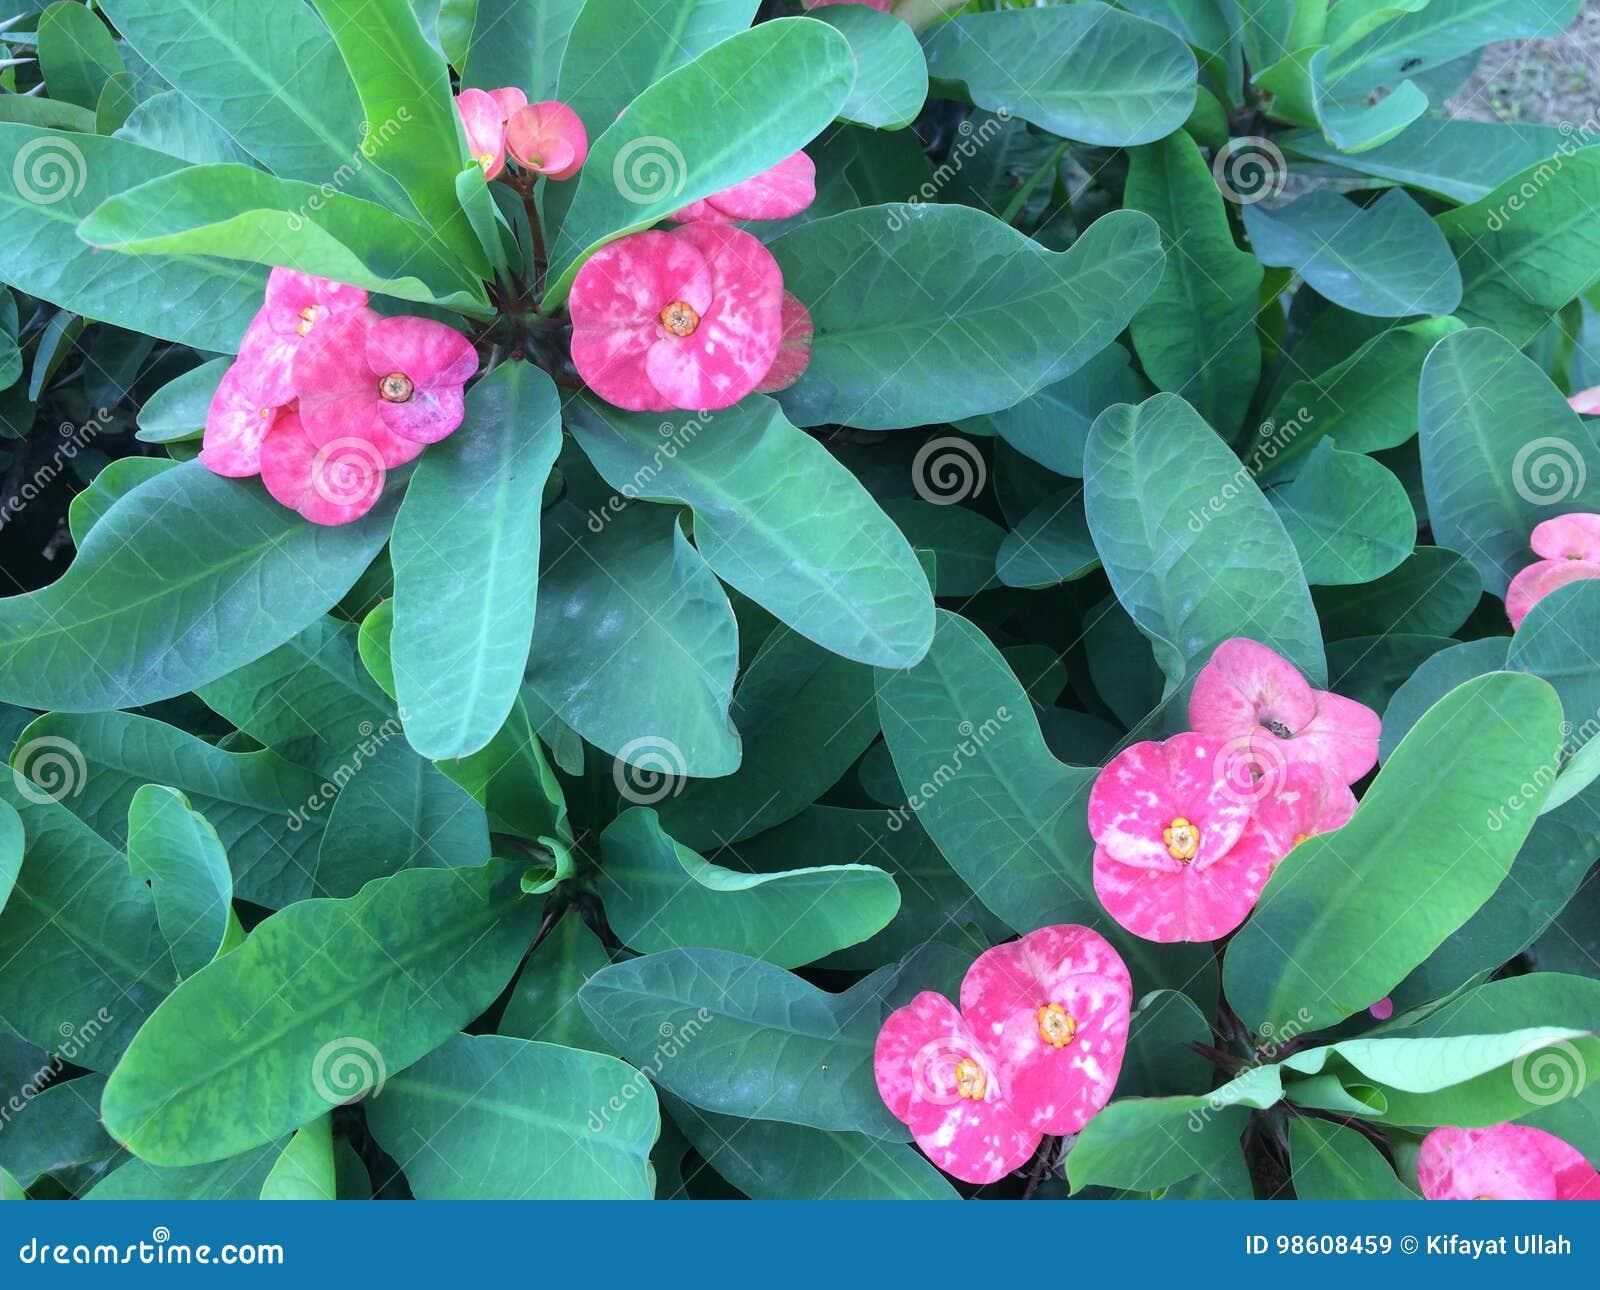 Pink little flower with long green leaves stock image image of download pink little flower with long green leaves stock image image of nice pink mightylinksfo